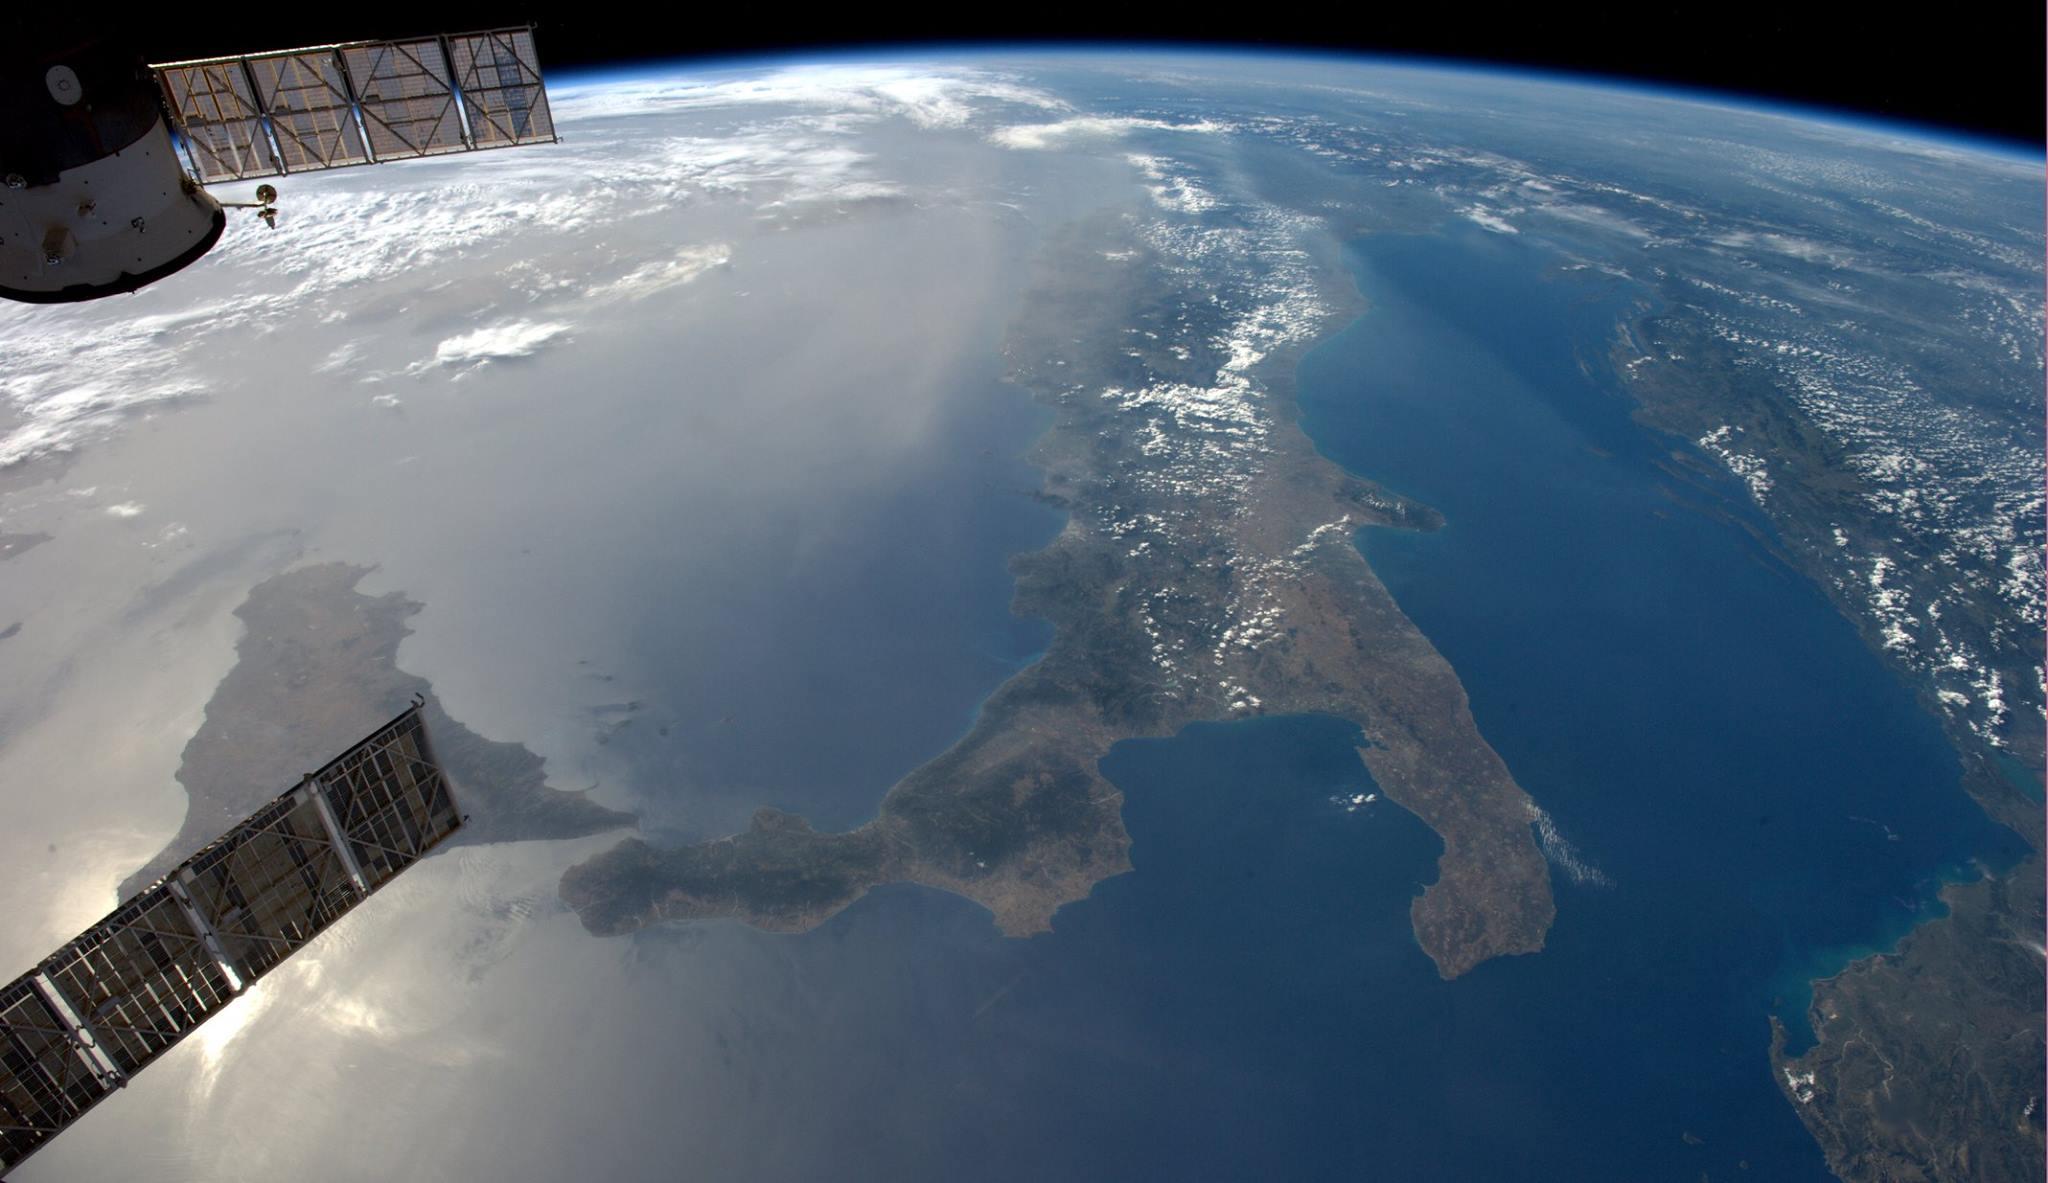 Photos astronaut Alexander Gerst 29